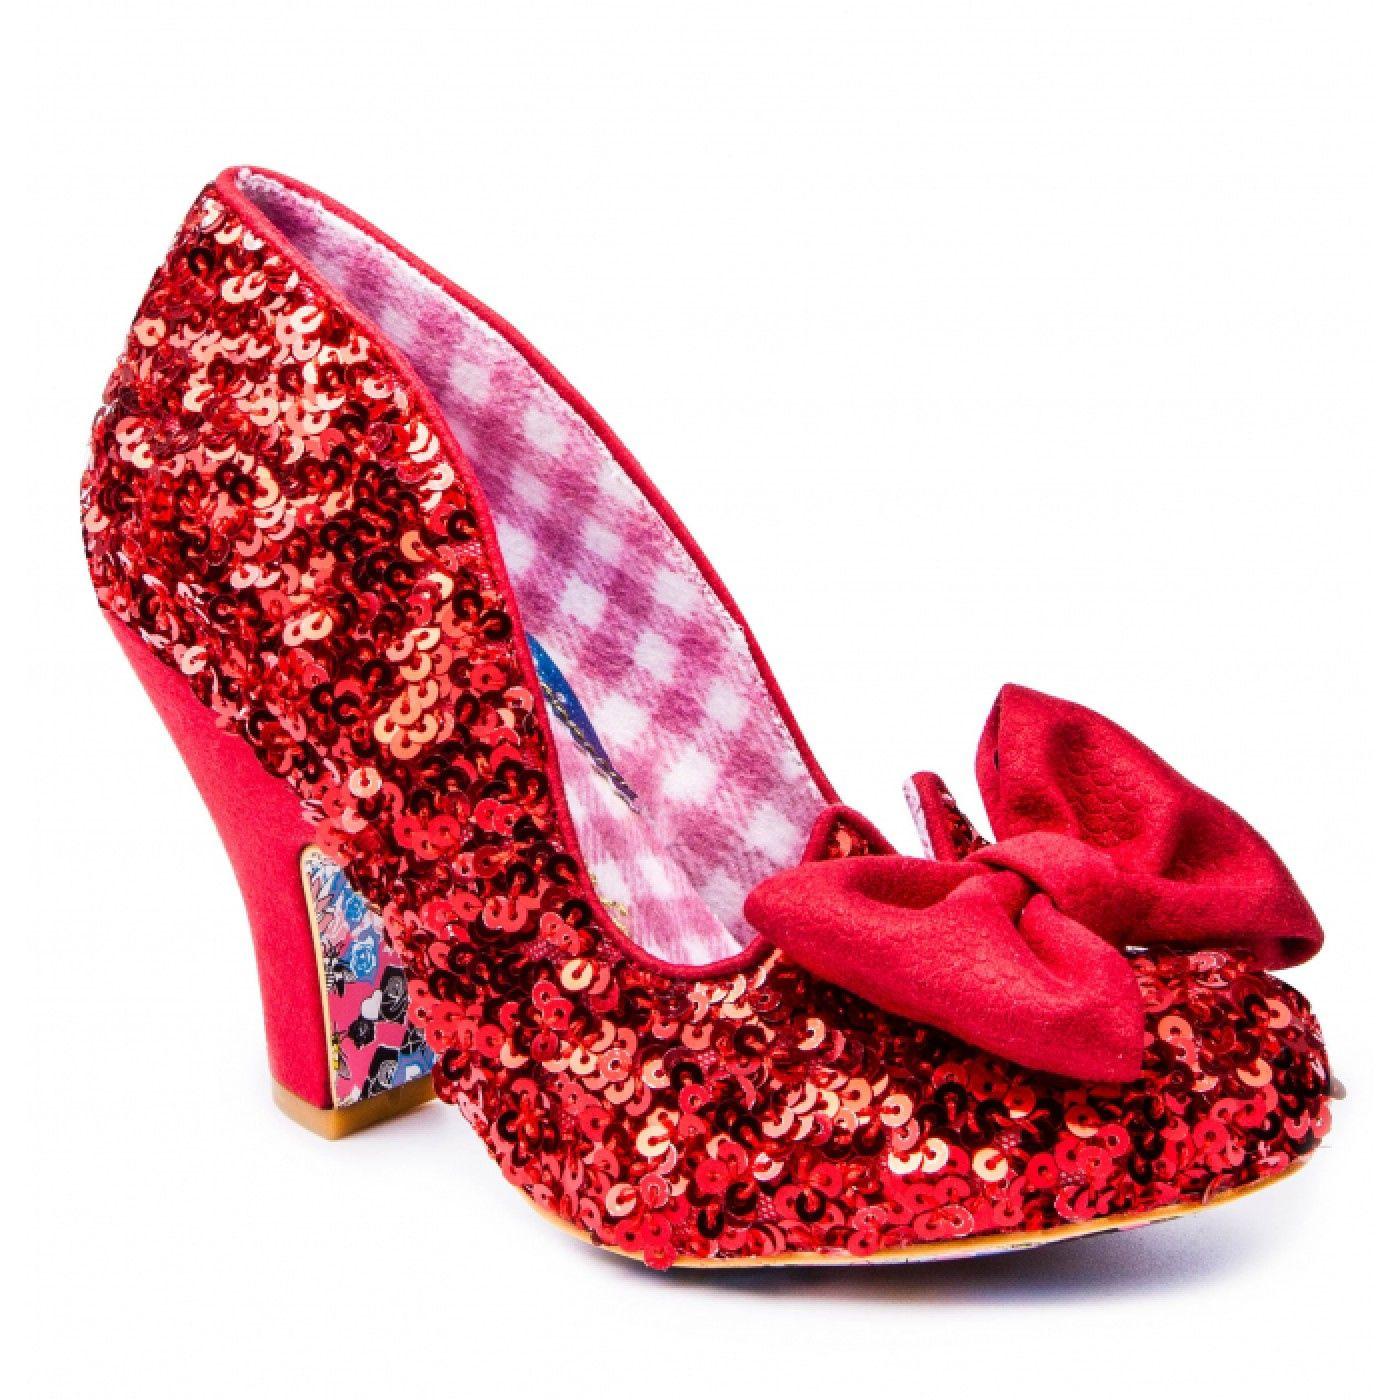 Stiletto Heel Zip Up Ankle Boots Shoes Irregular Choice /'/'Royal Velvet/'/' C